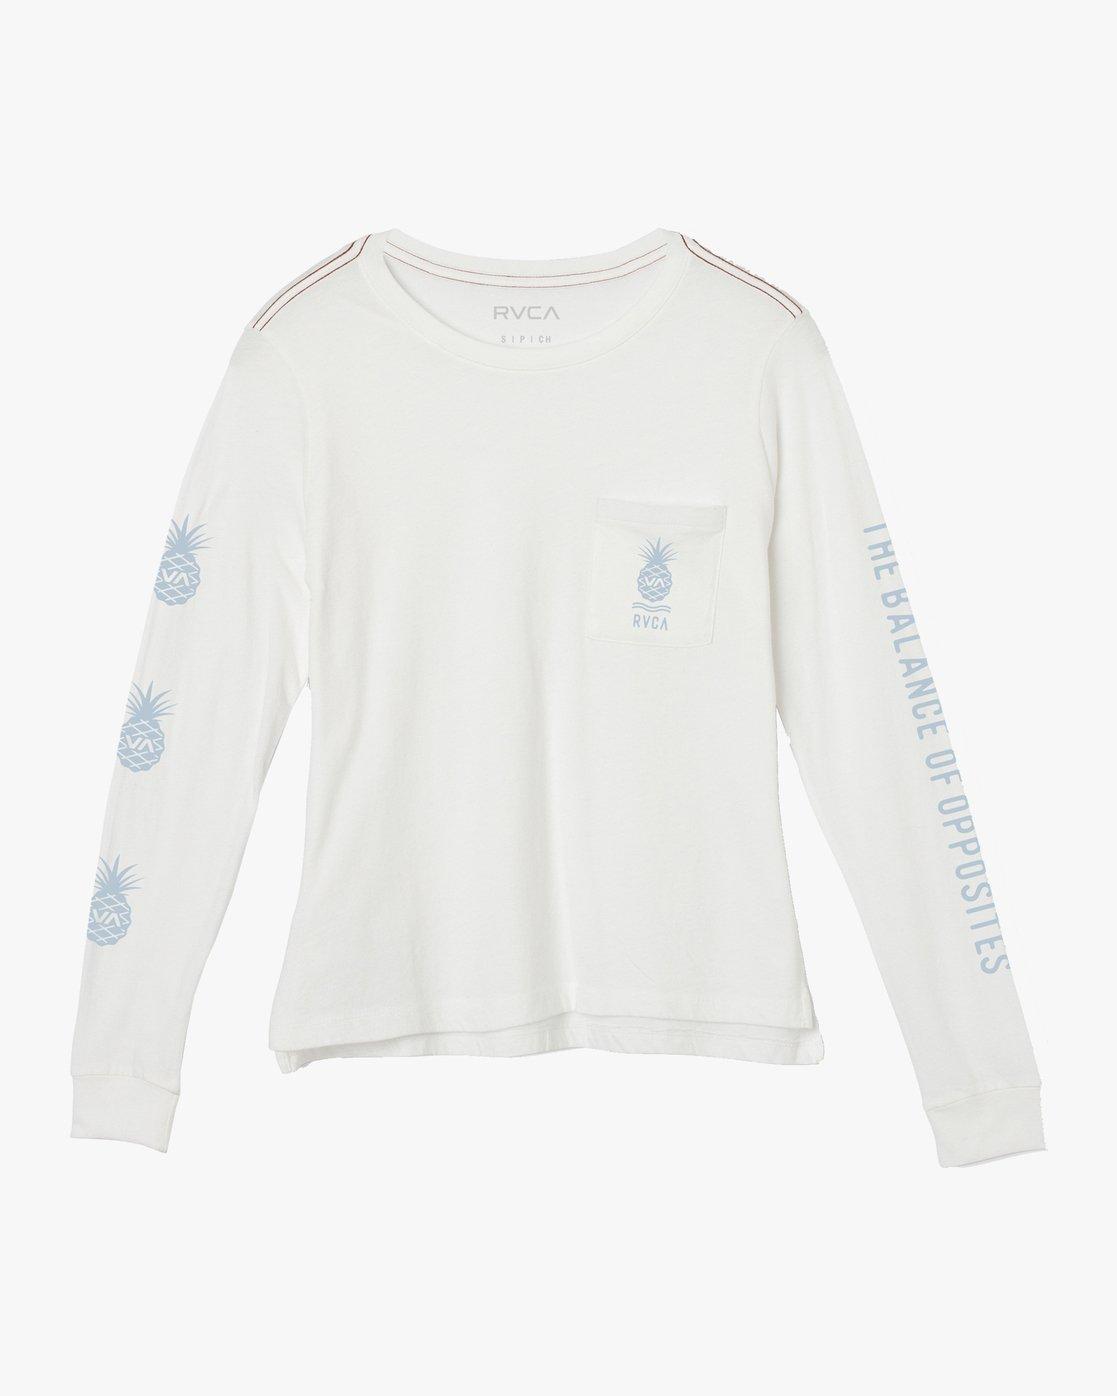 0 Rising Pineapple Long Sleeve T-Shirt White W456URRP RVCA